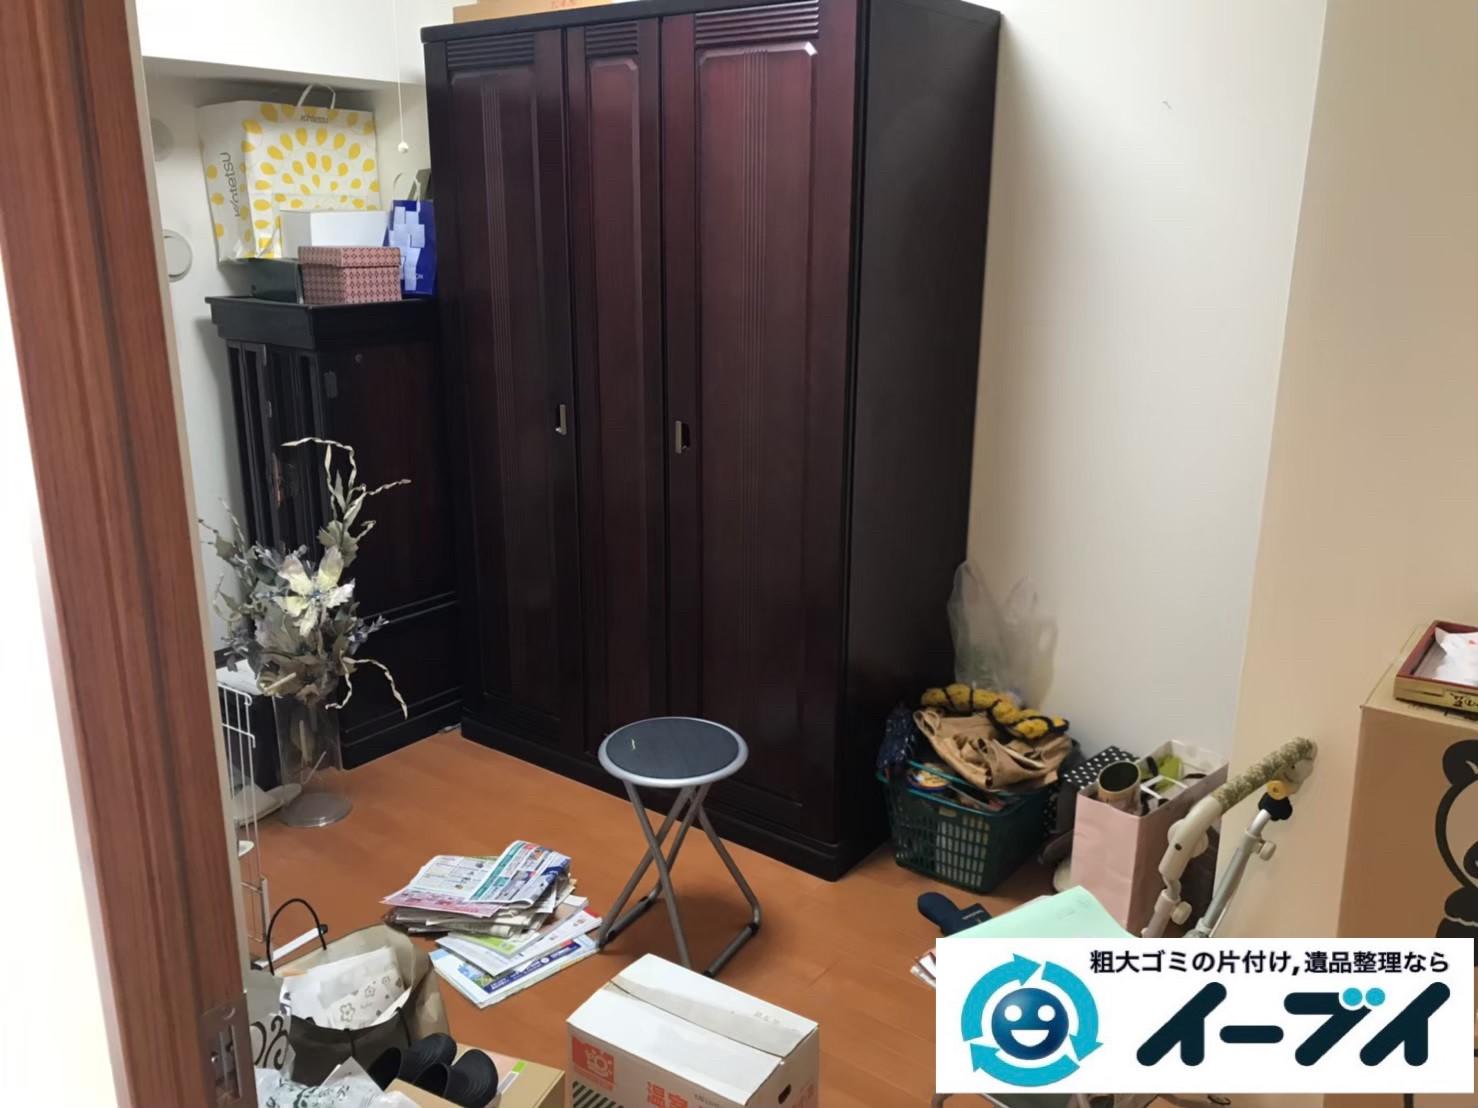 2019年9月18日大阪府大阪市西成区で和箪笥の大型家具の不用品回収。写真1